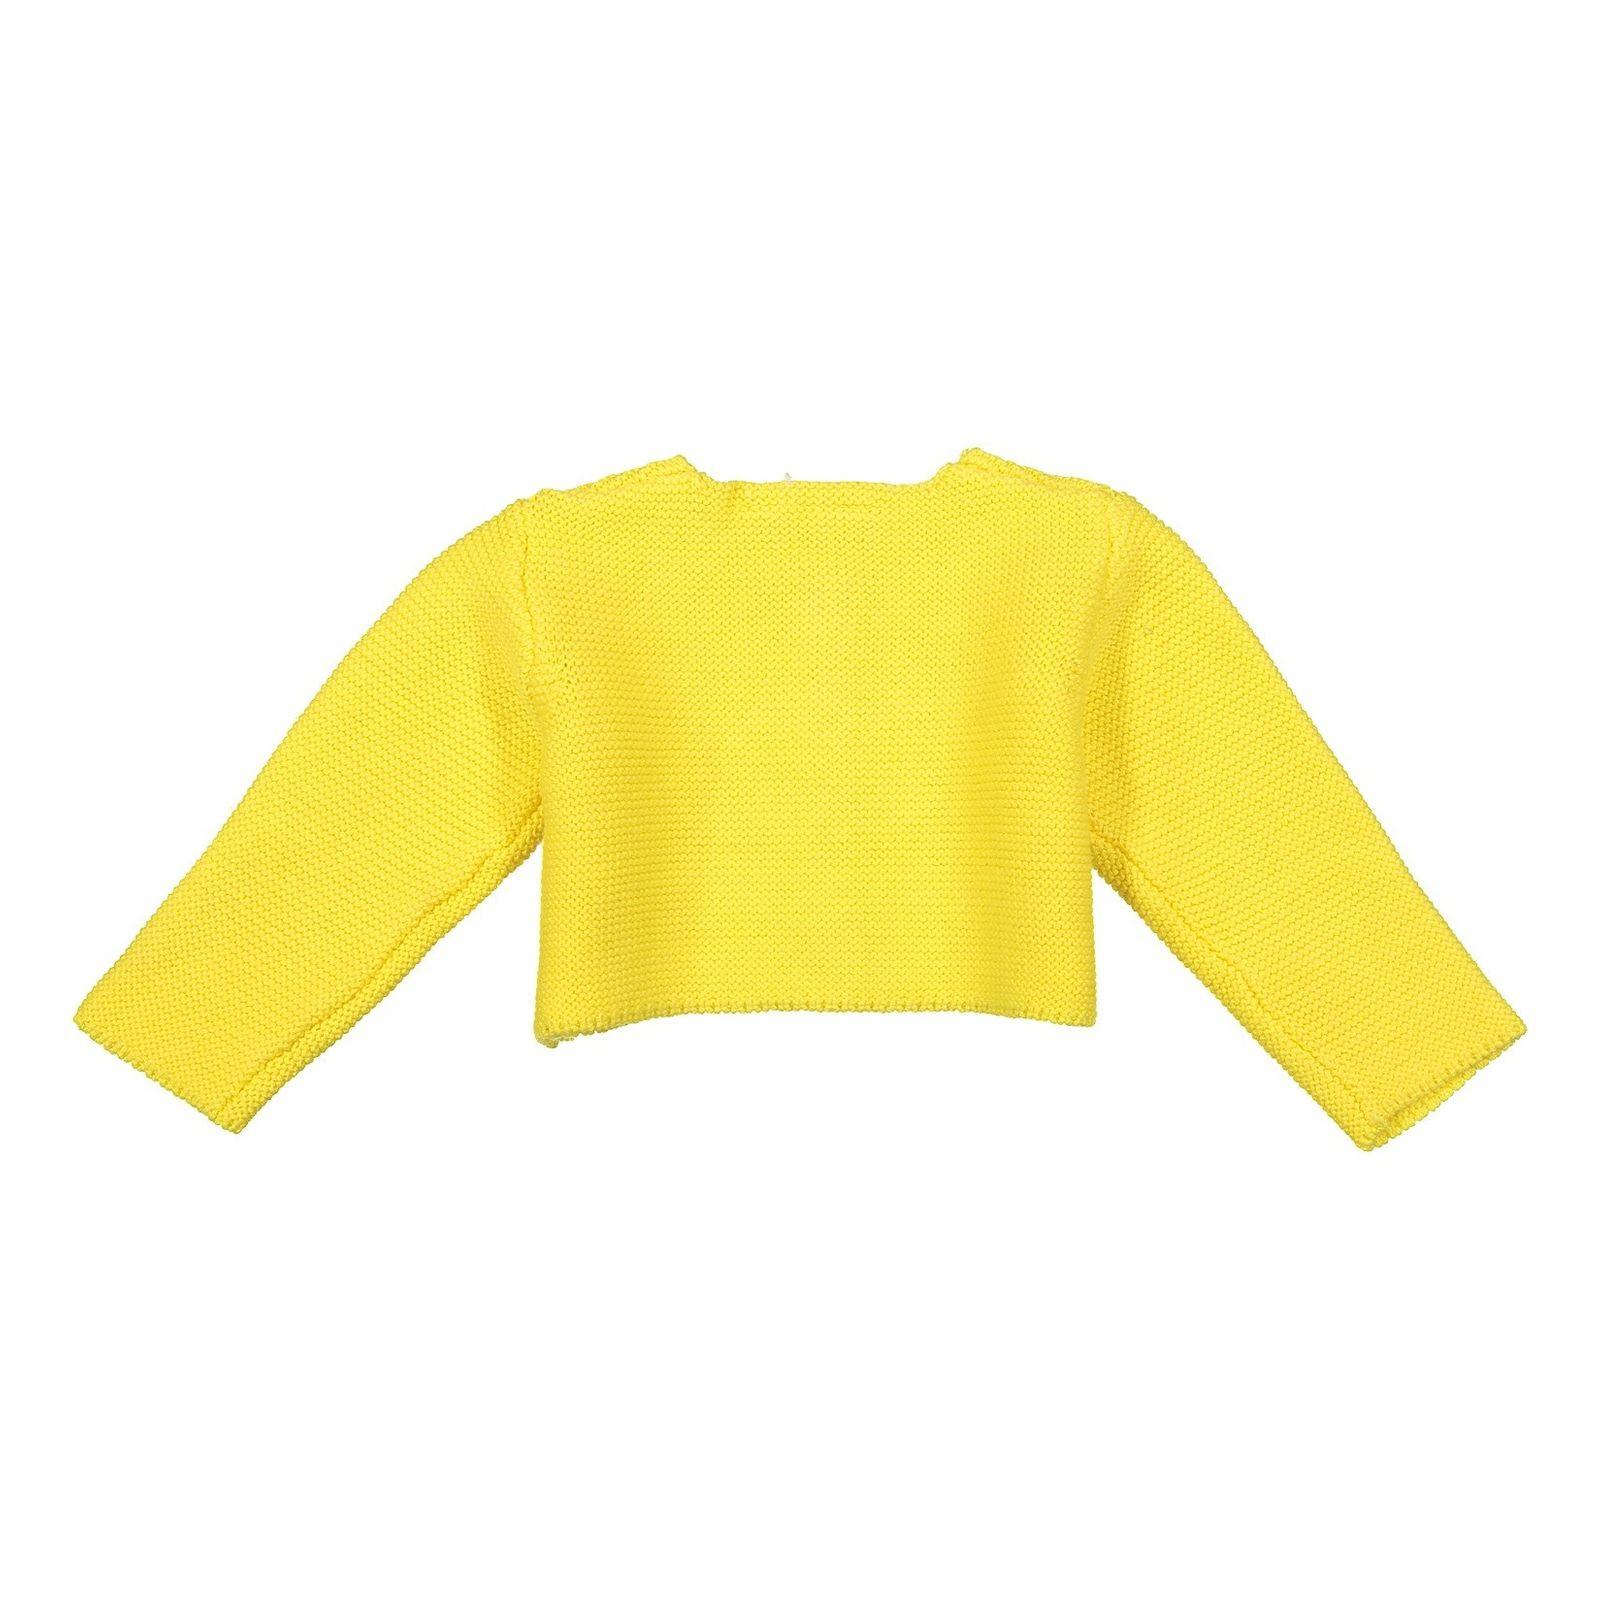 ژاکت نخی نوزادی دخترانه - بلوکیدز - زرد - 2